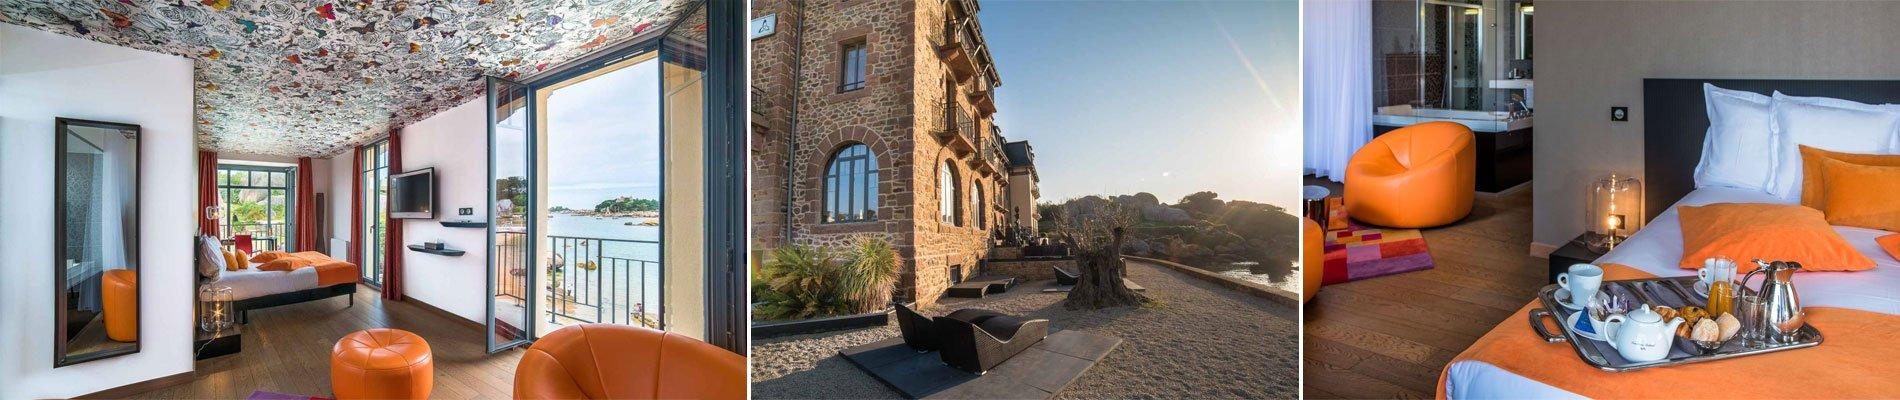 castel-beau-site-bretagne-autorondreis-003.jpg